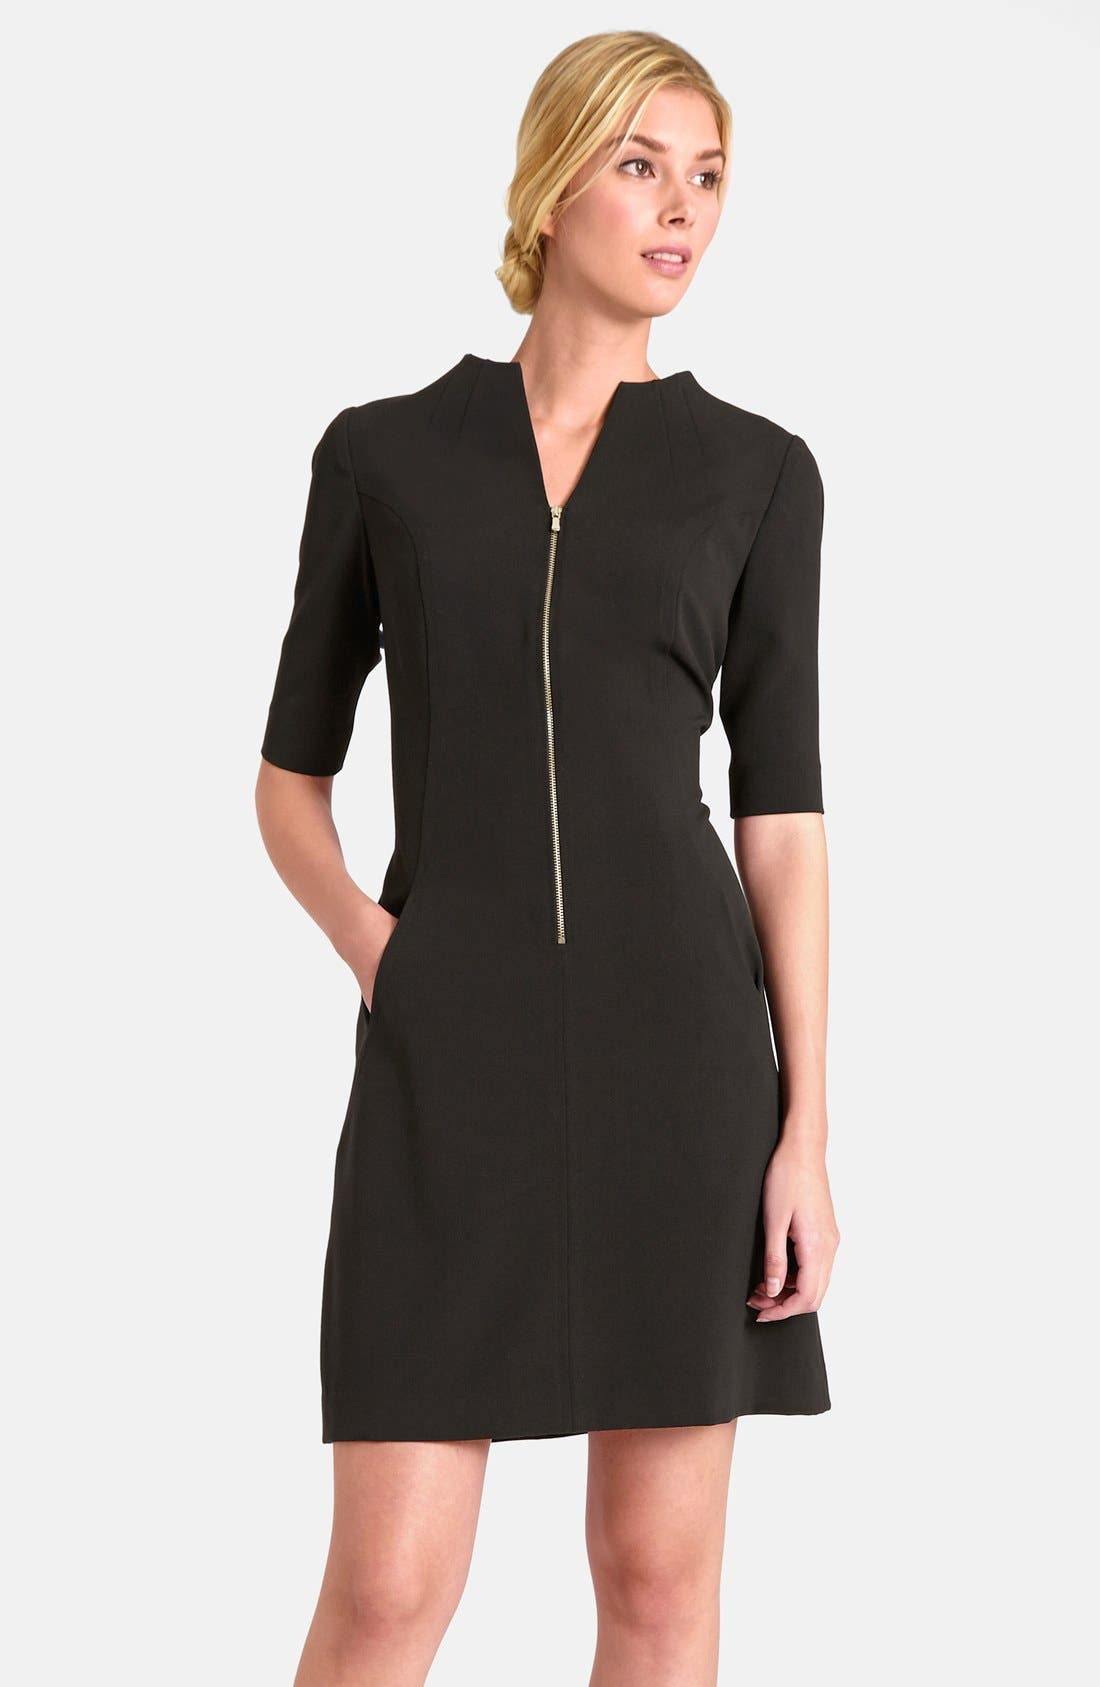 Alternate Image 1 Selected - Tahari Elbow Sleeve Front Zip Sheath Dress